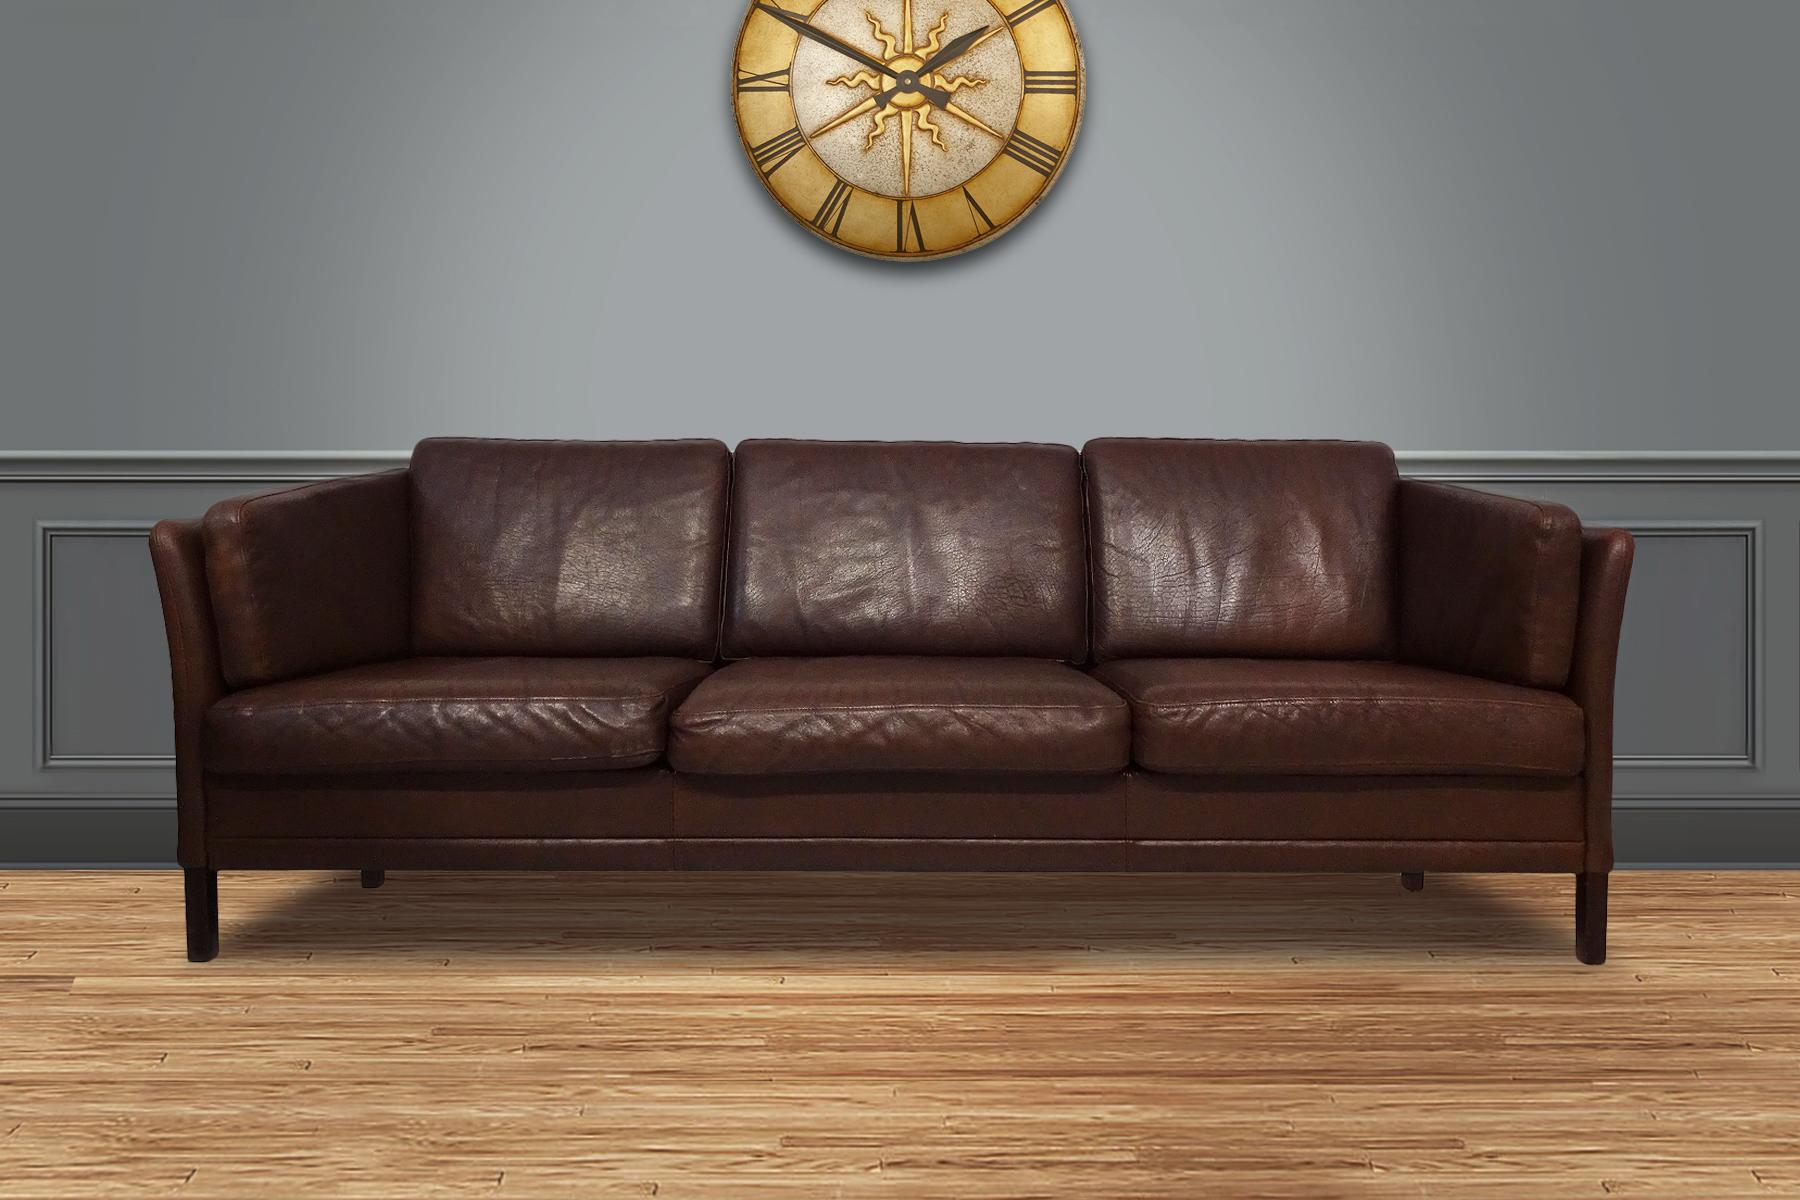 Phenomenal Danish Mid Century 3 Person Sofa By Mogens Hansen Ncnpc Chair Design For Home Ncnpcorg